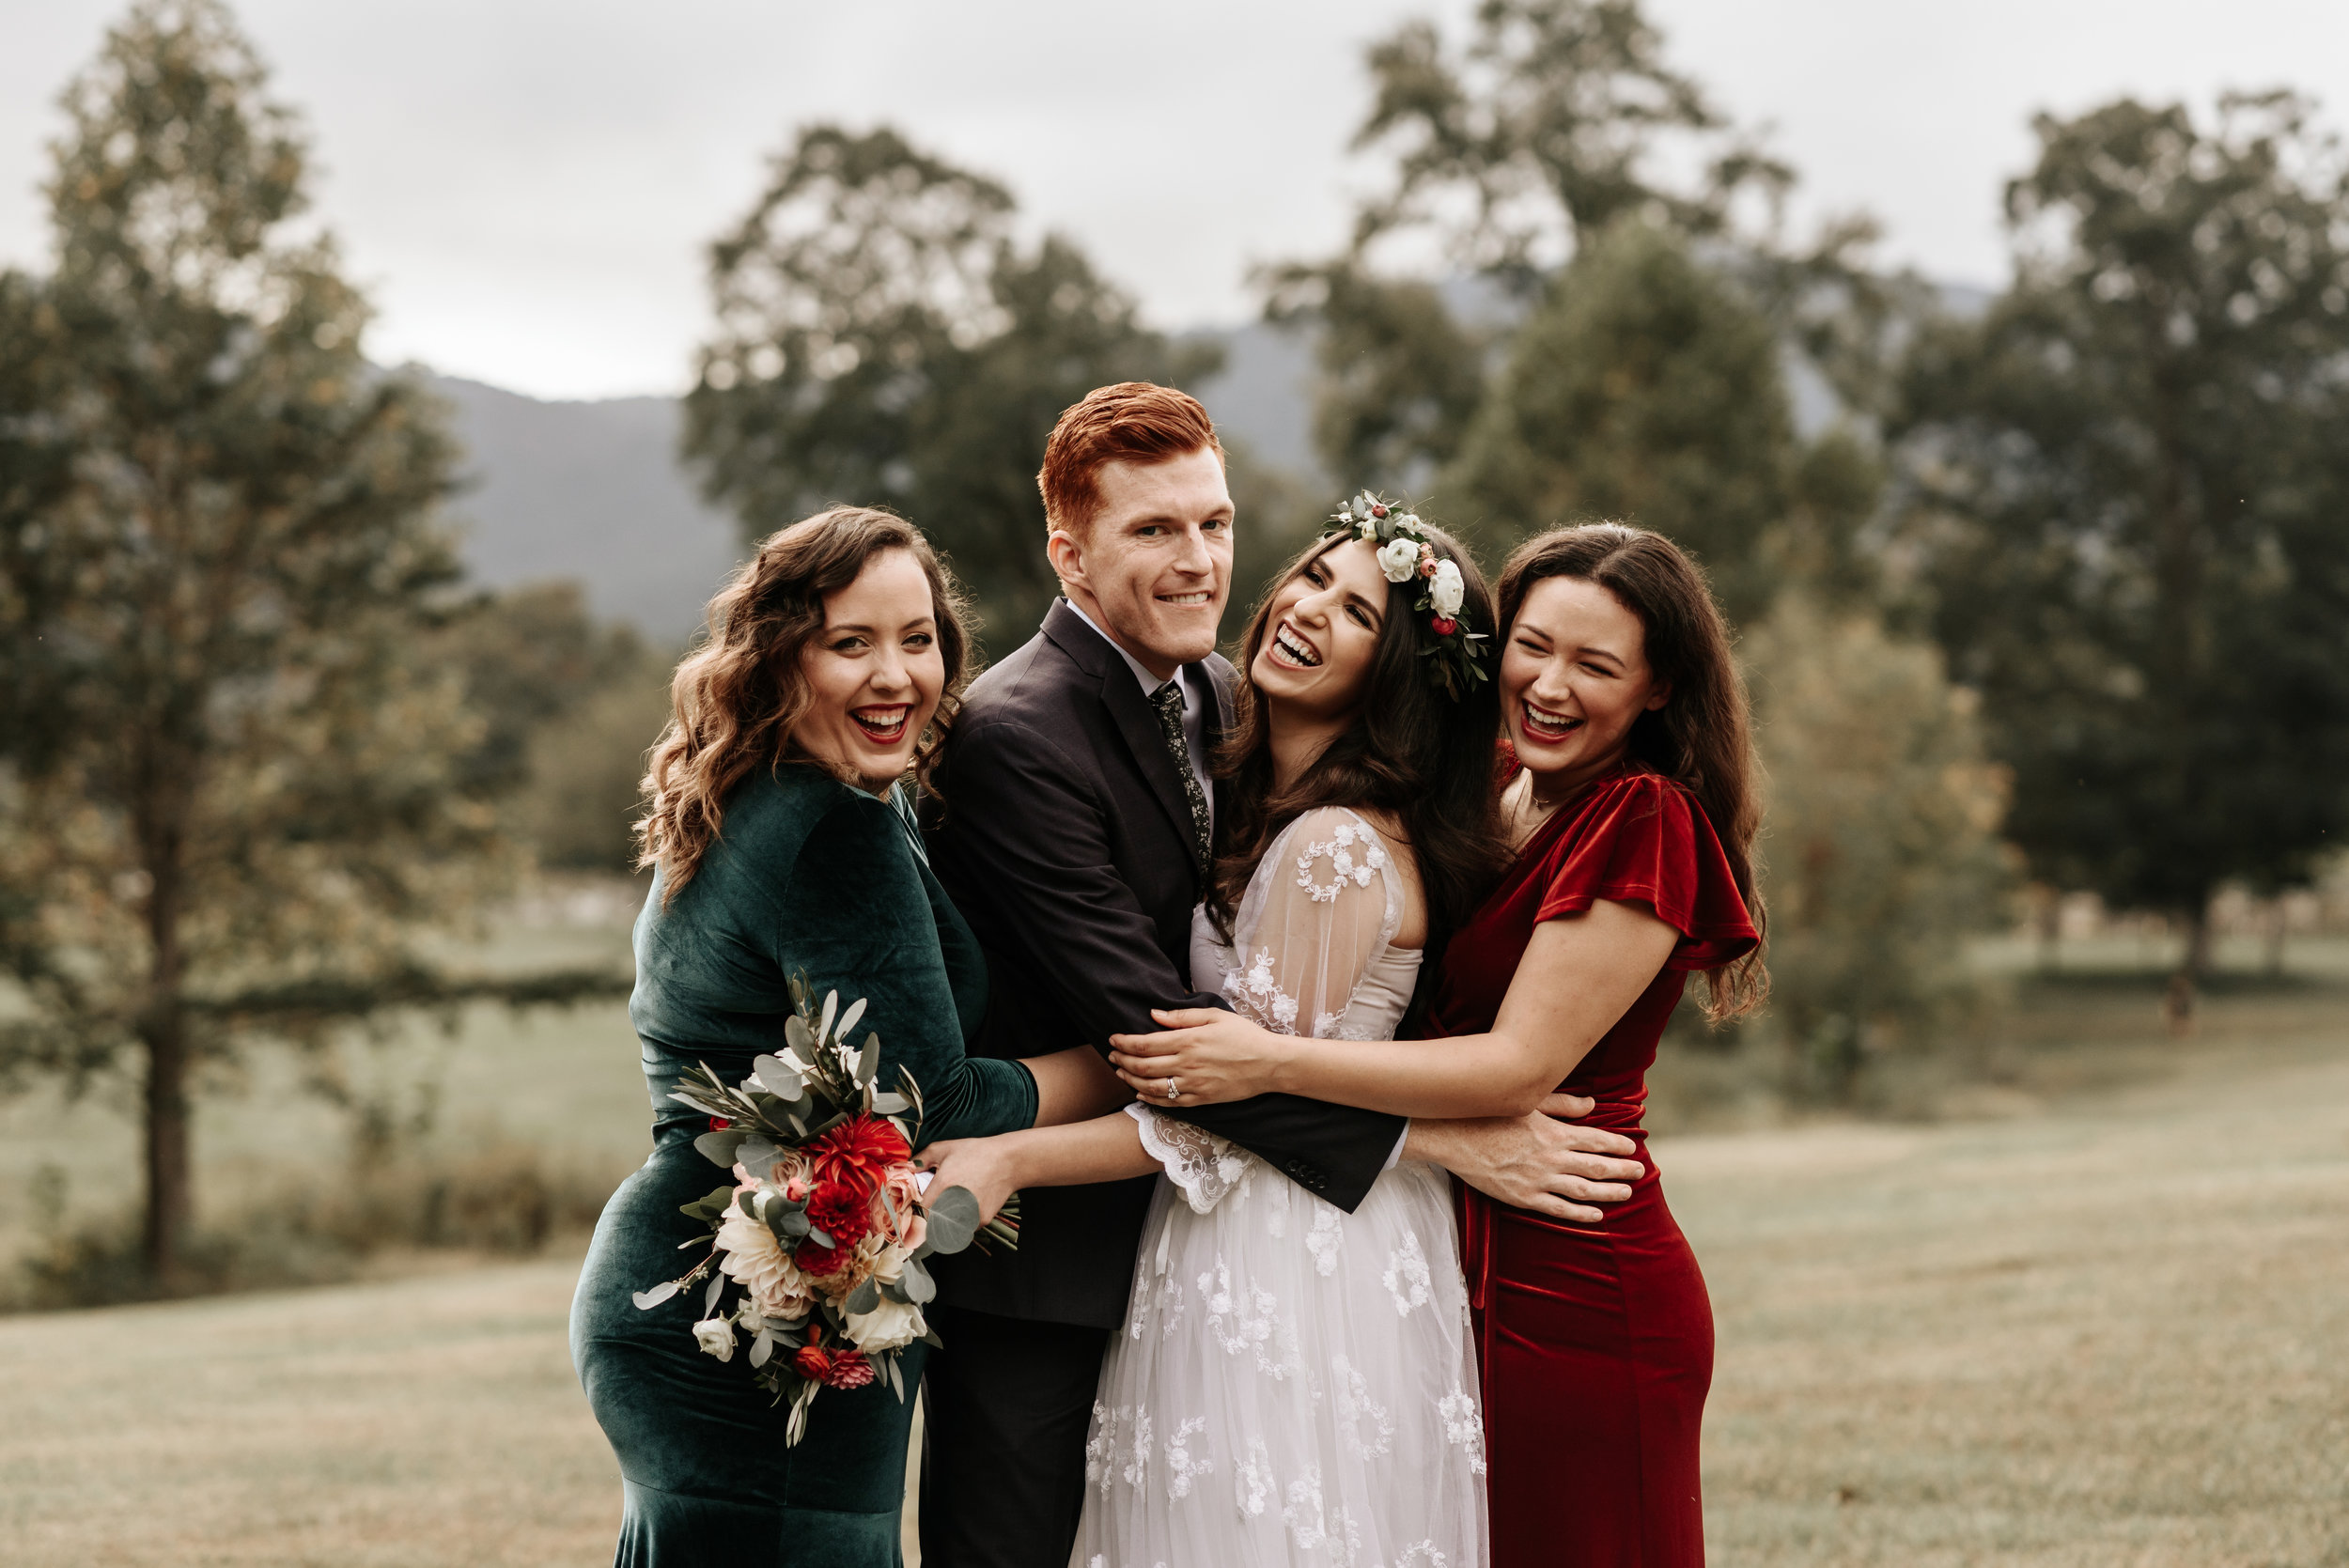 Veritas-Vineyards-and-Winery-Wedding-Photography-Afton-Virginia-Yasmin-Seth-Photography-by-V-2390.jpg